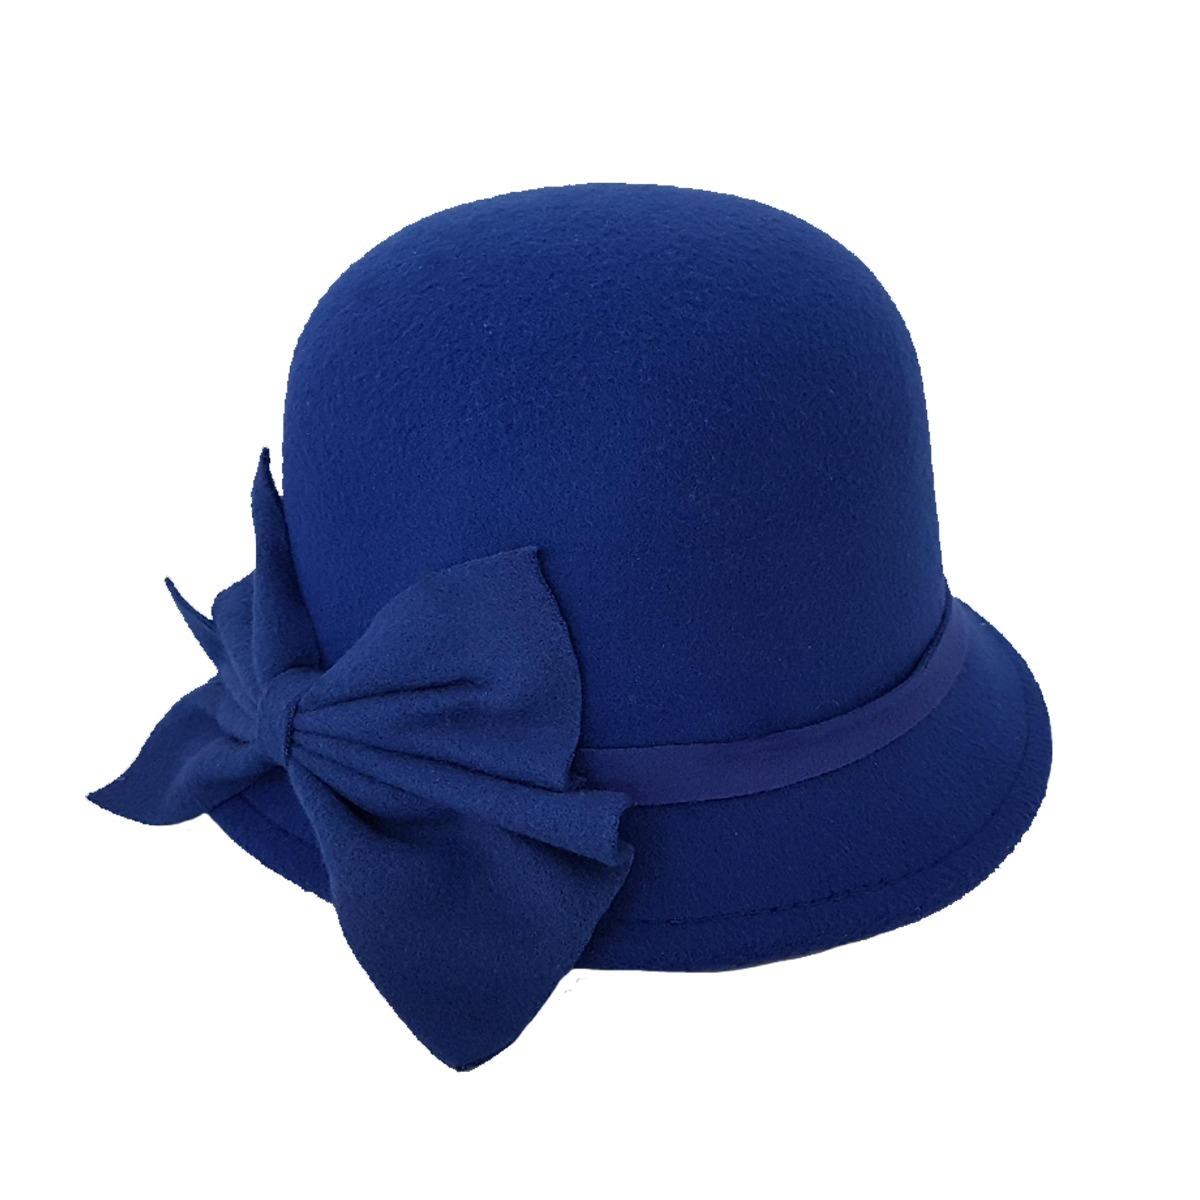 22c2ff2ac80b4 chapéu fedora feminino. Carregando zoom.